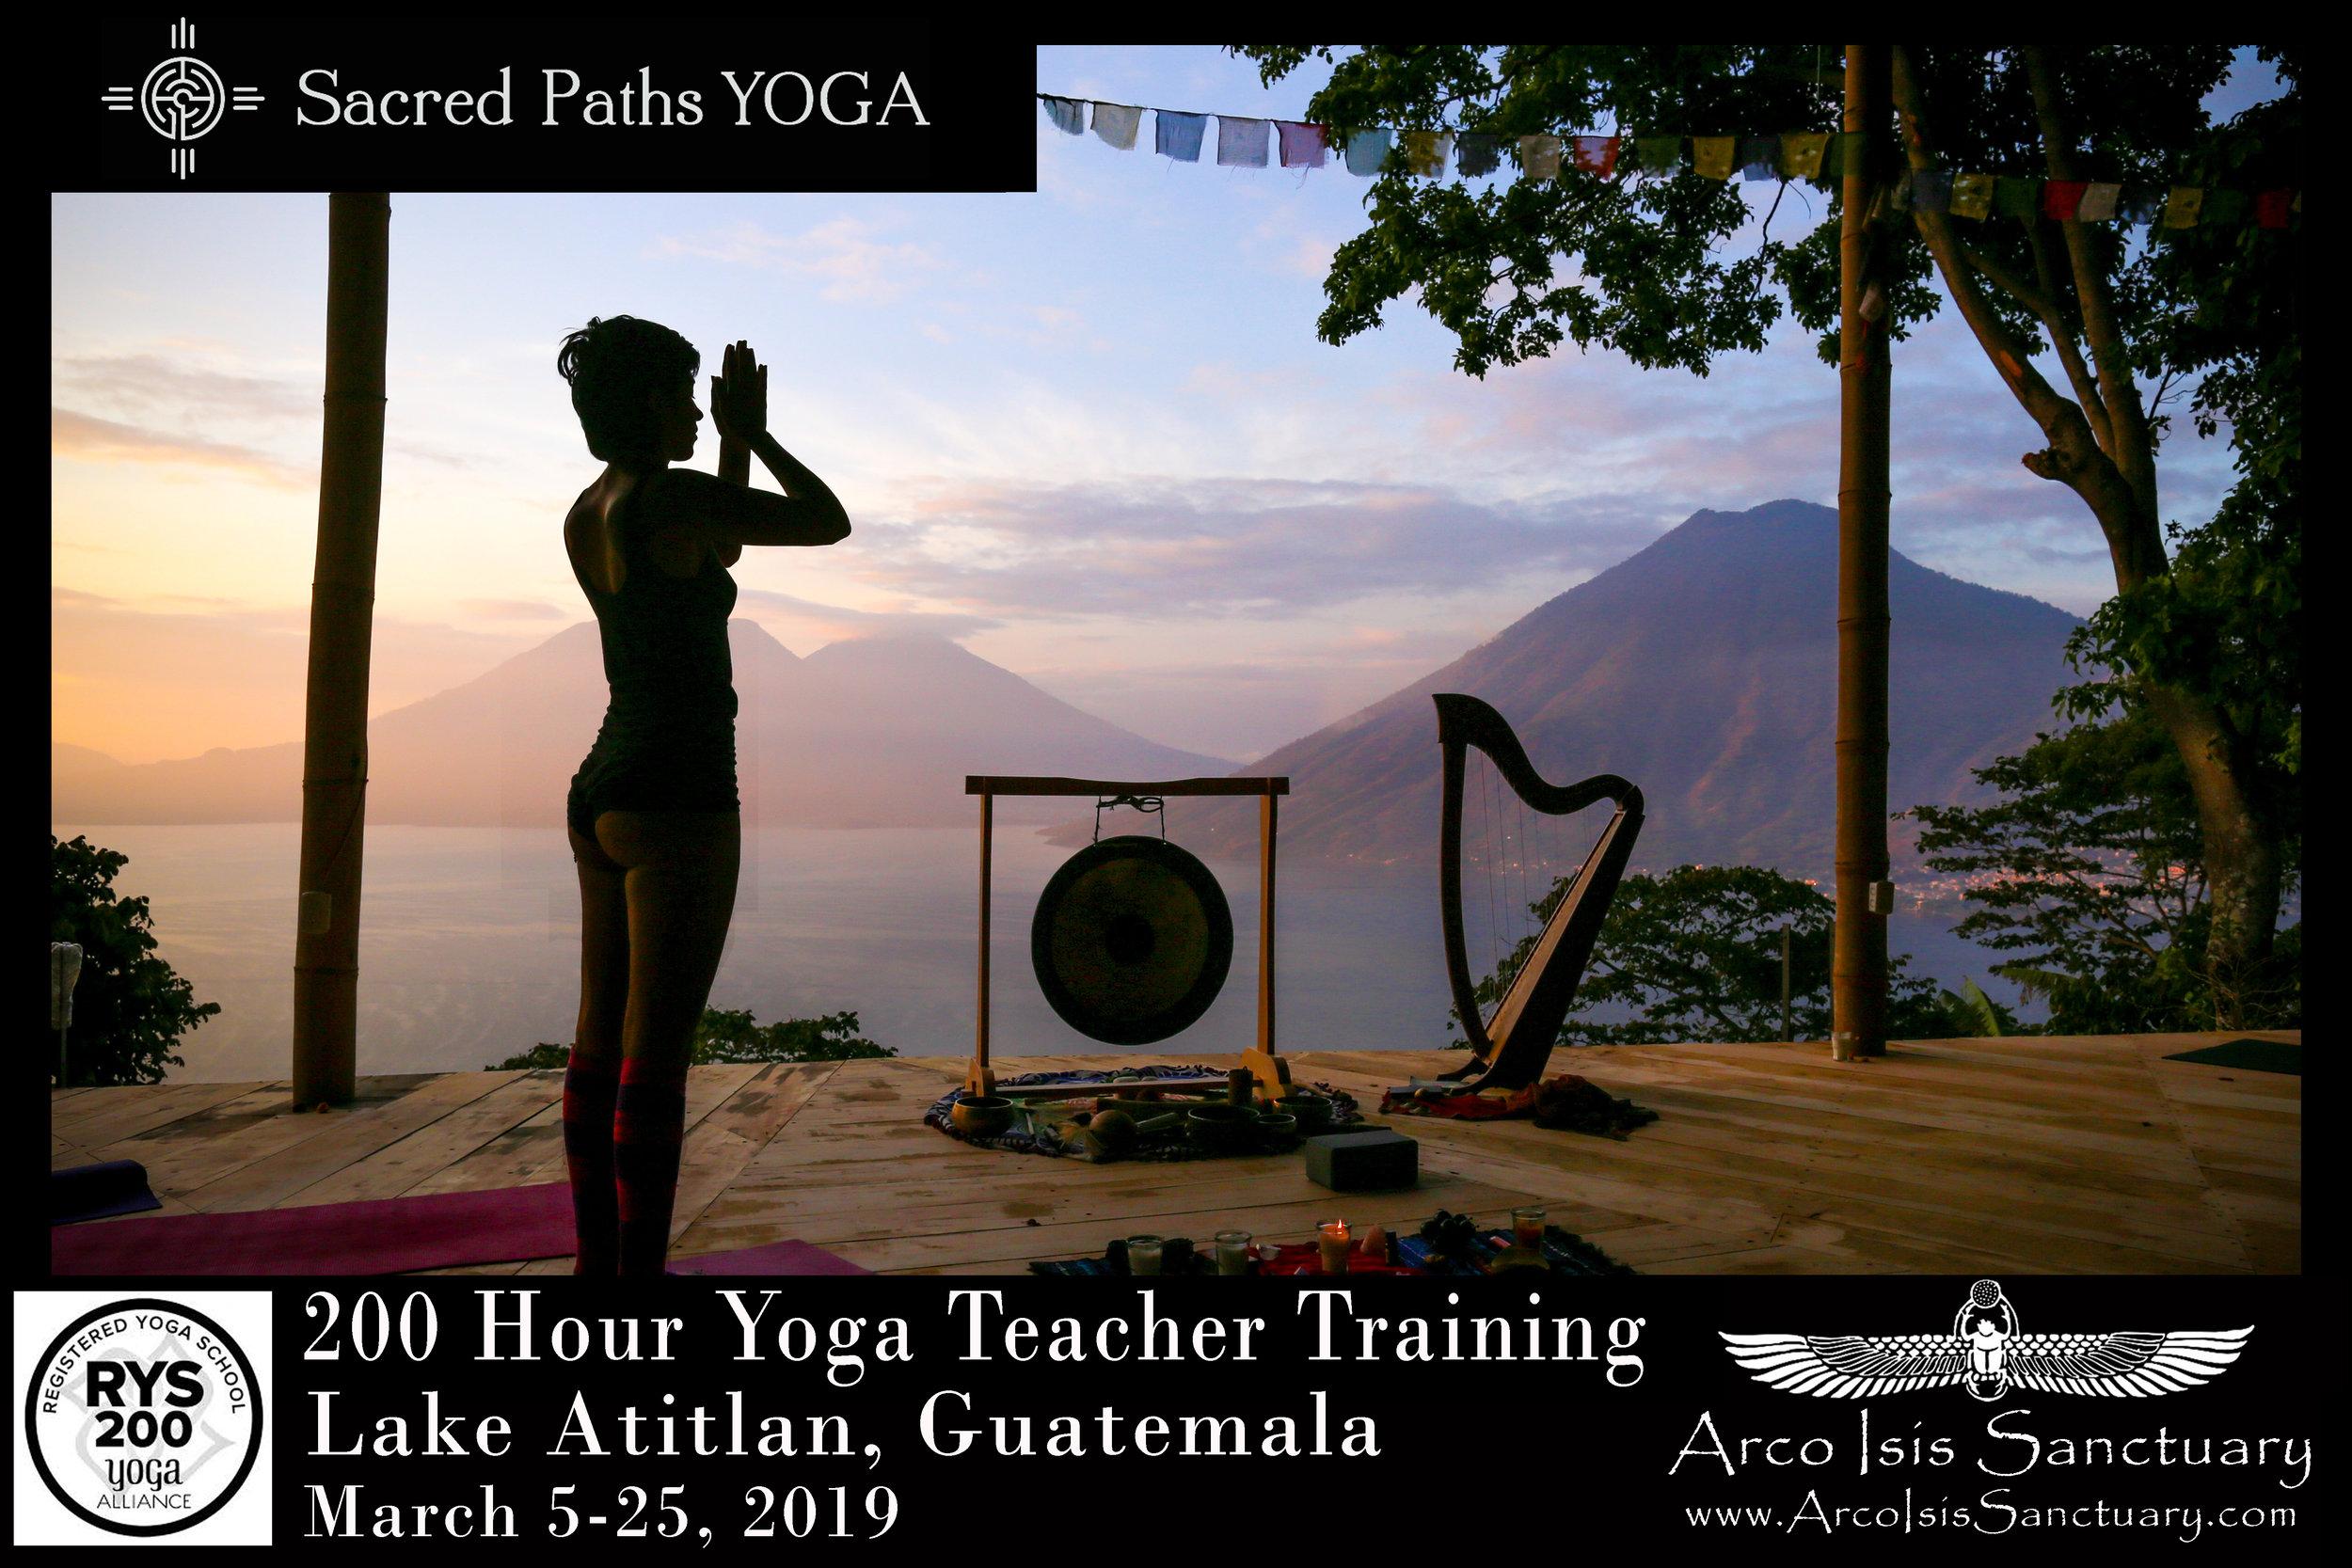 yogateachertraining.jpg